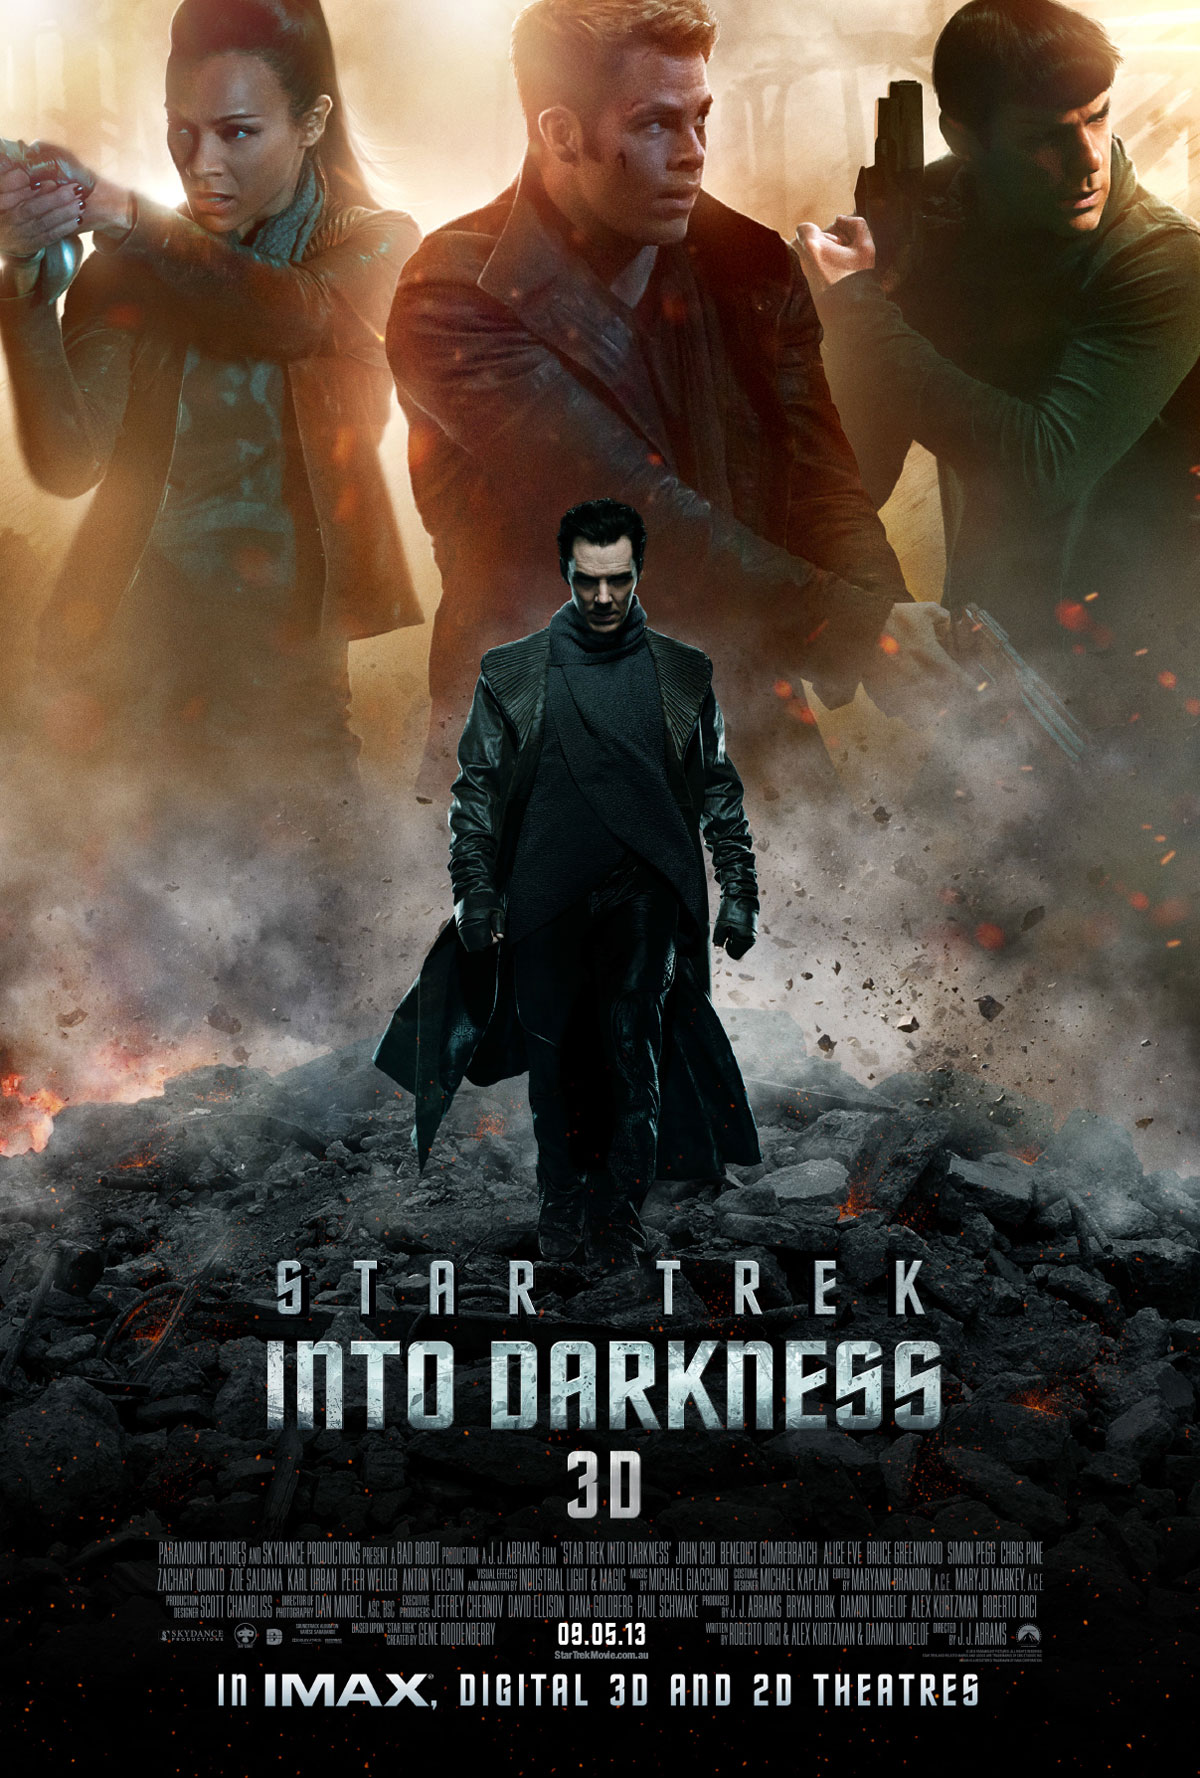 Star Trek into darkness – poster